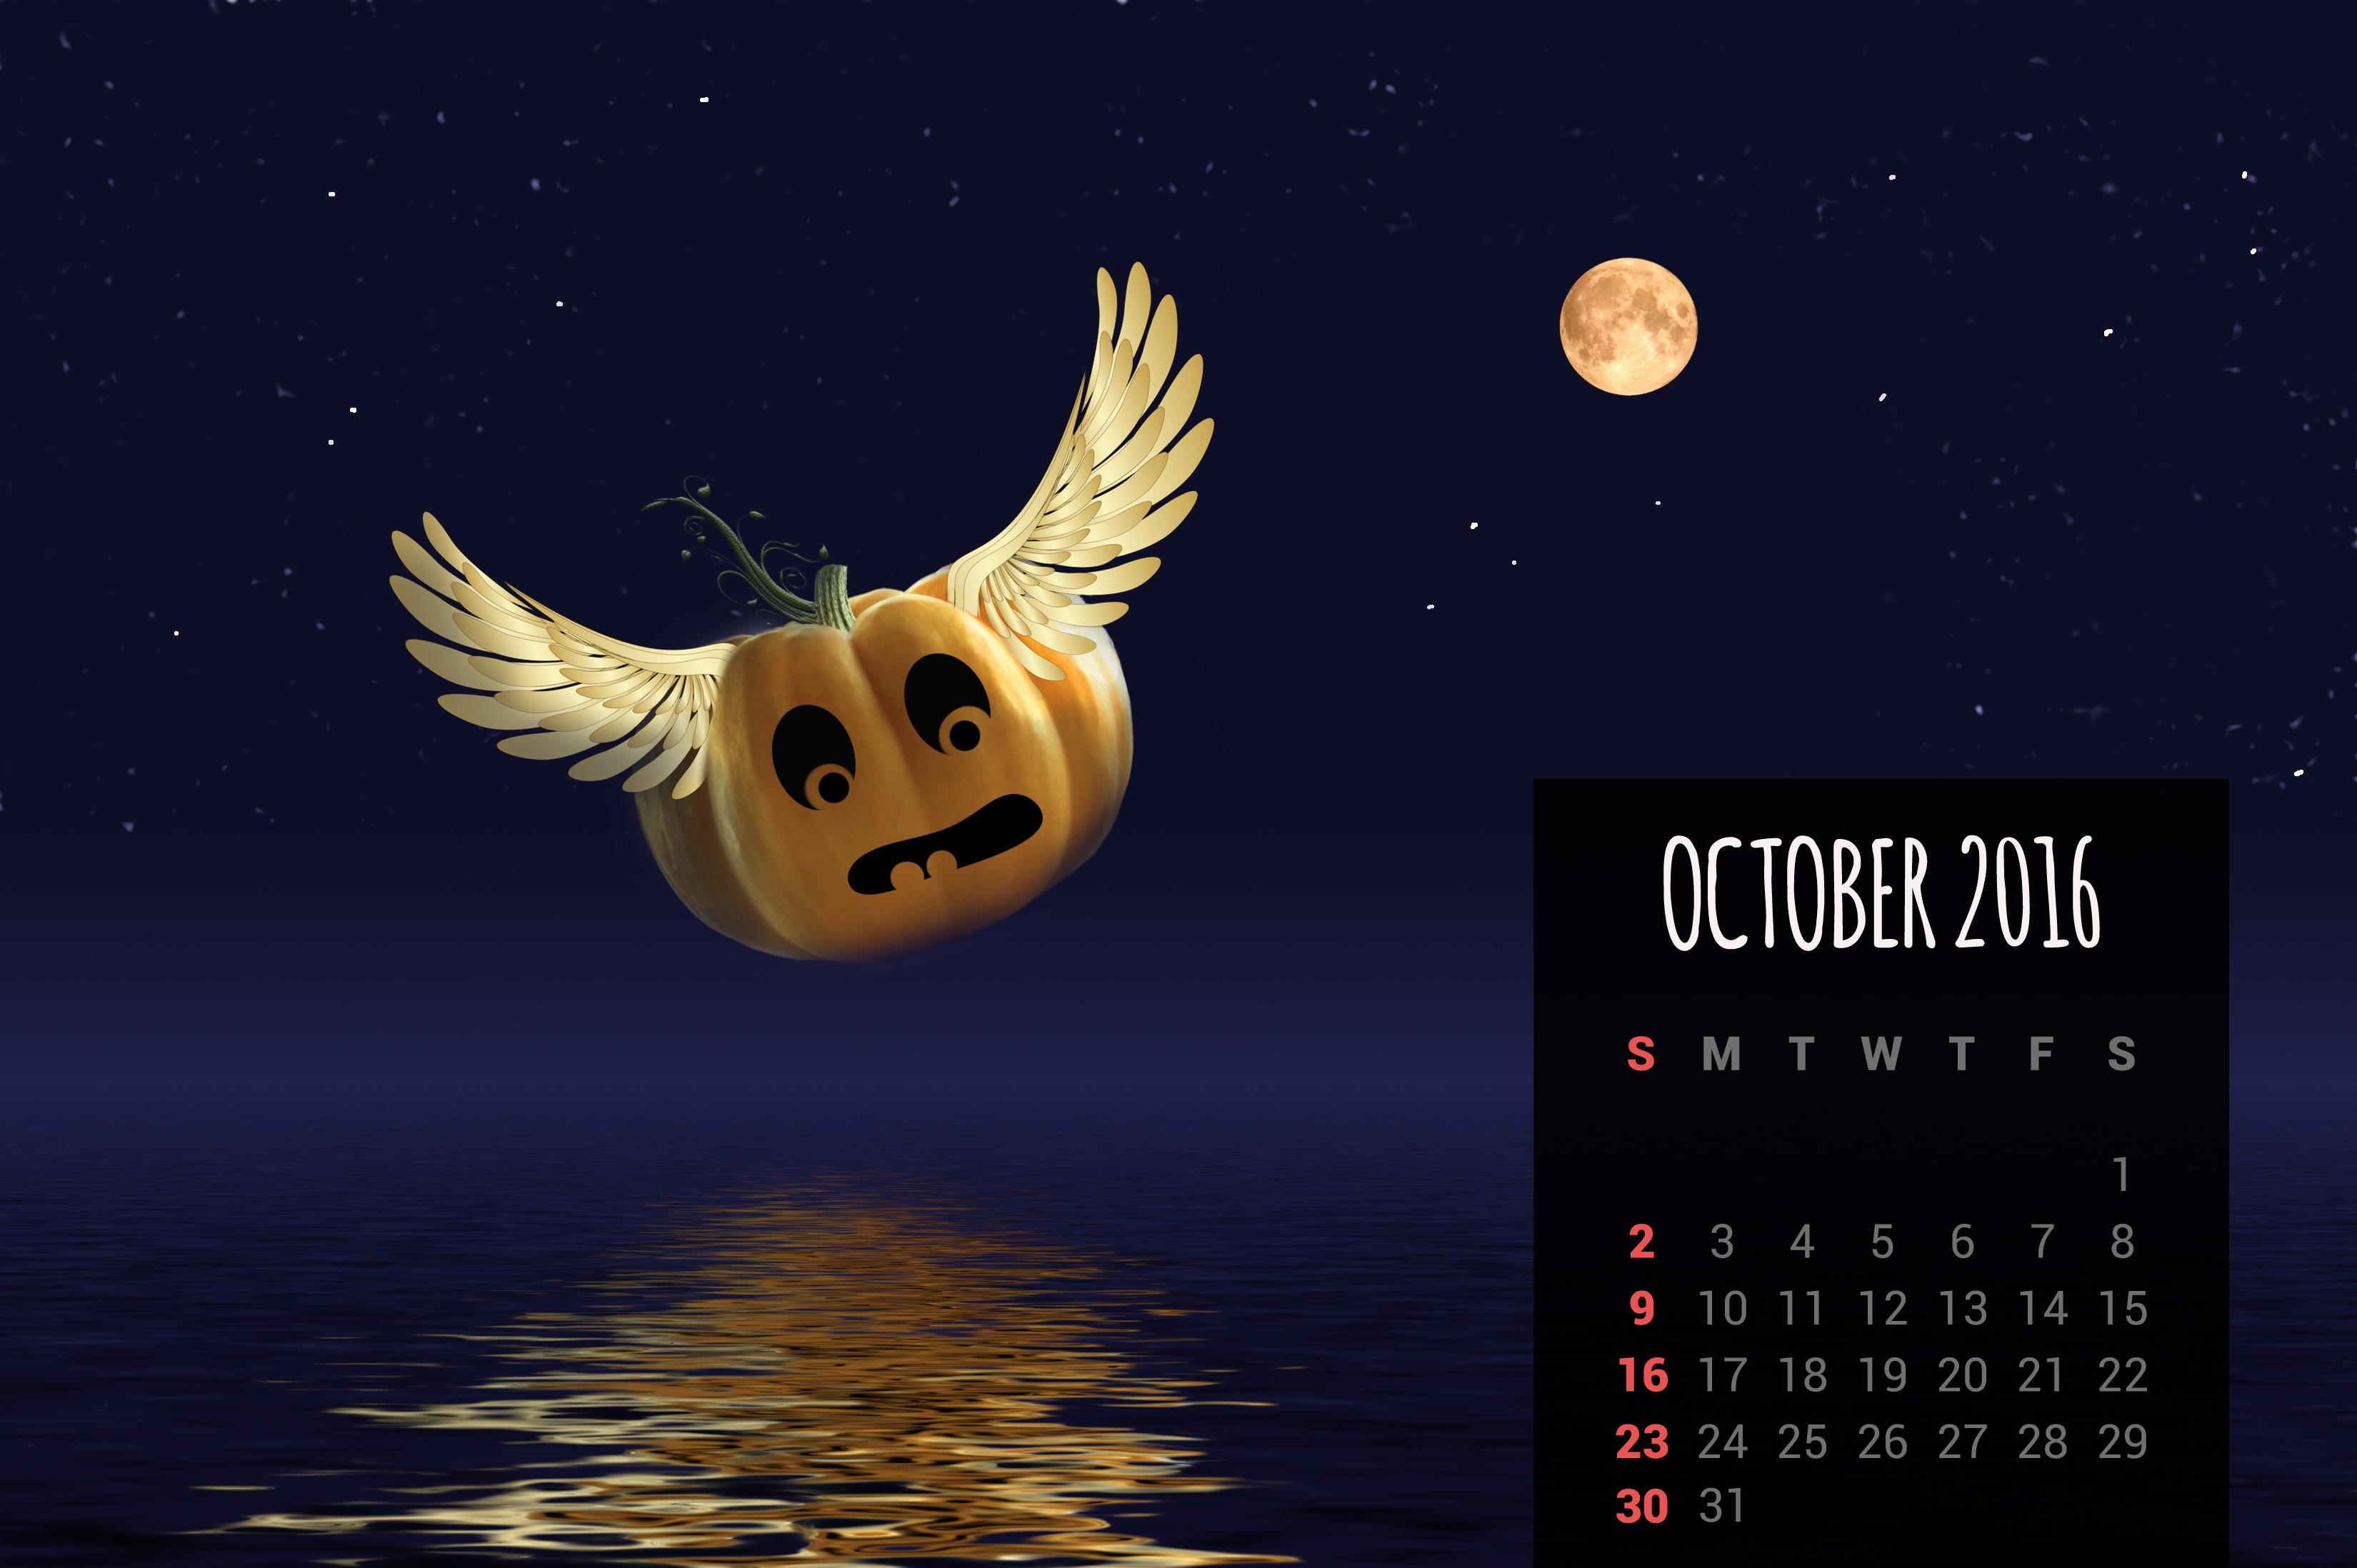 calendar wallpapers free october 2016 desktop backgrounds